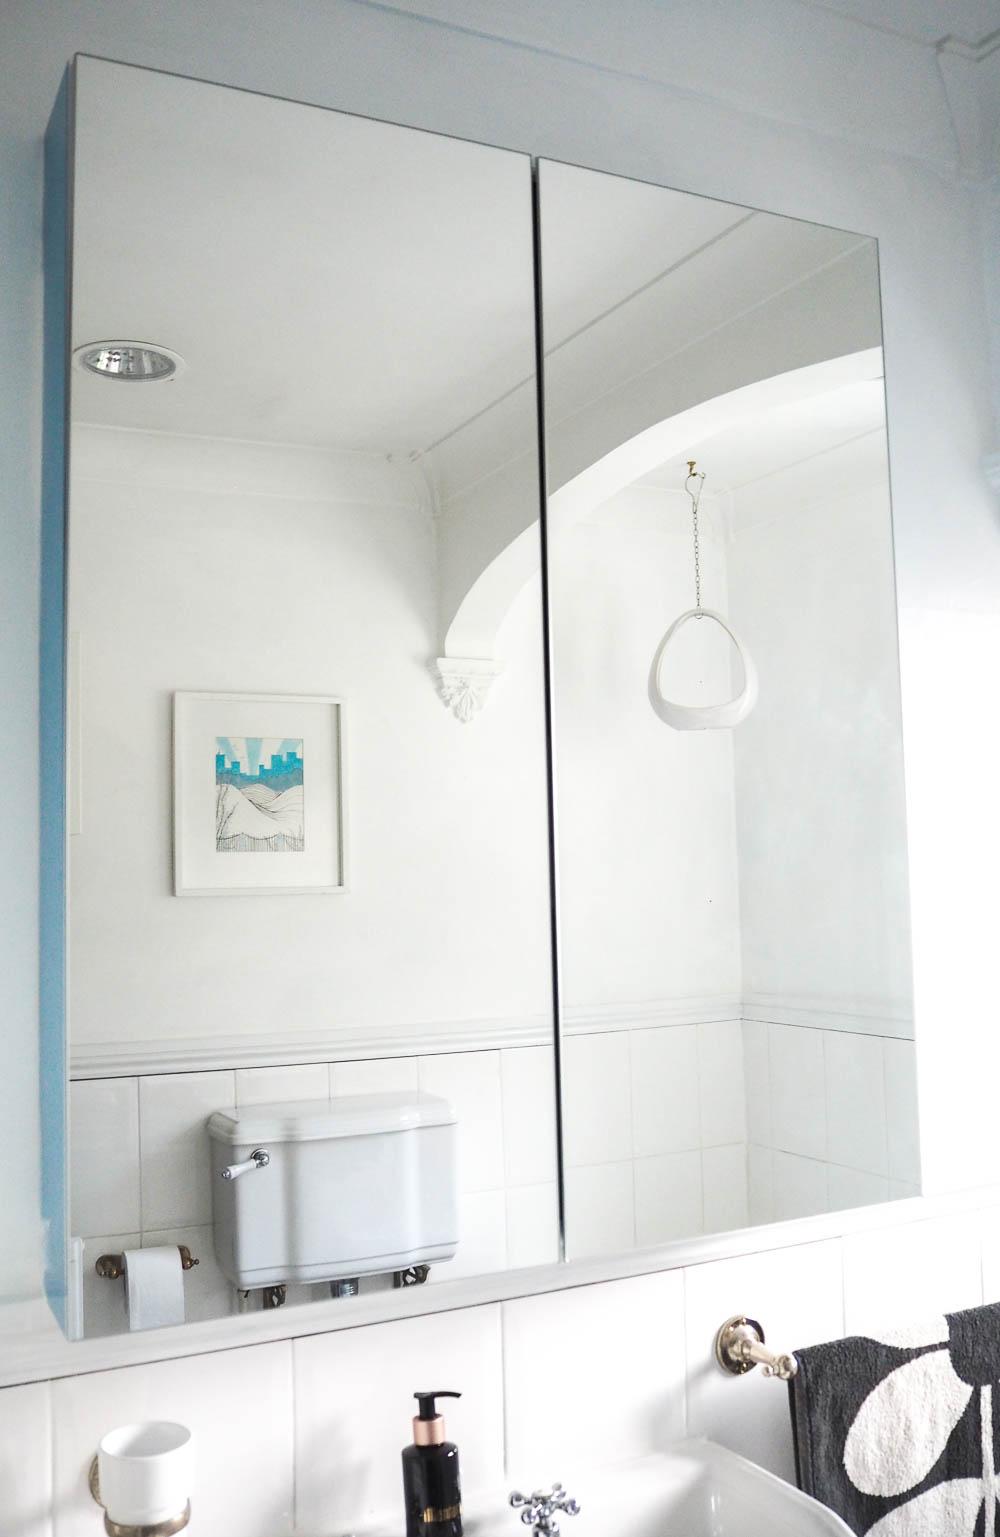 The Ikea Godmorgon Bathroom Mirror Cabinet Mirror Cabinets Bathroom Mirror Cabinet Bathroom Mirror Storage